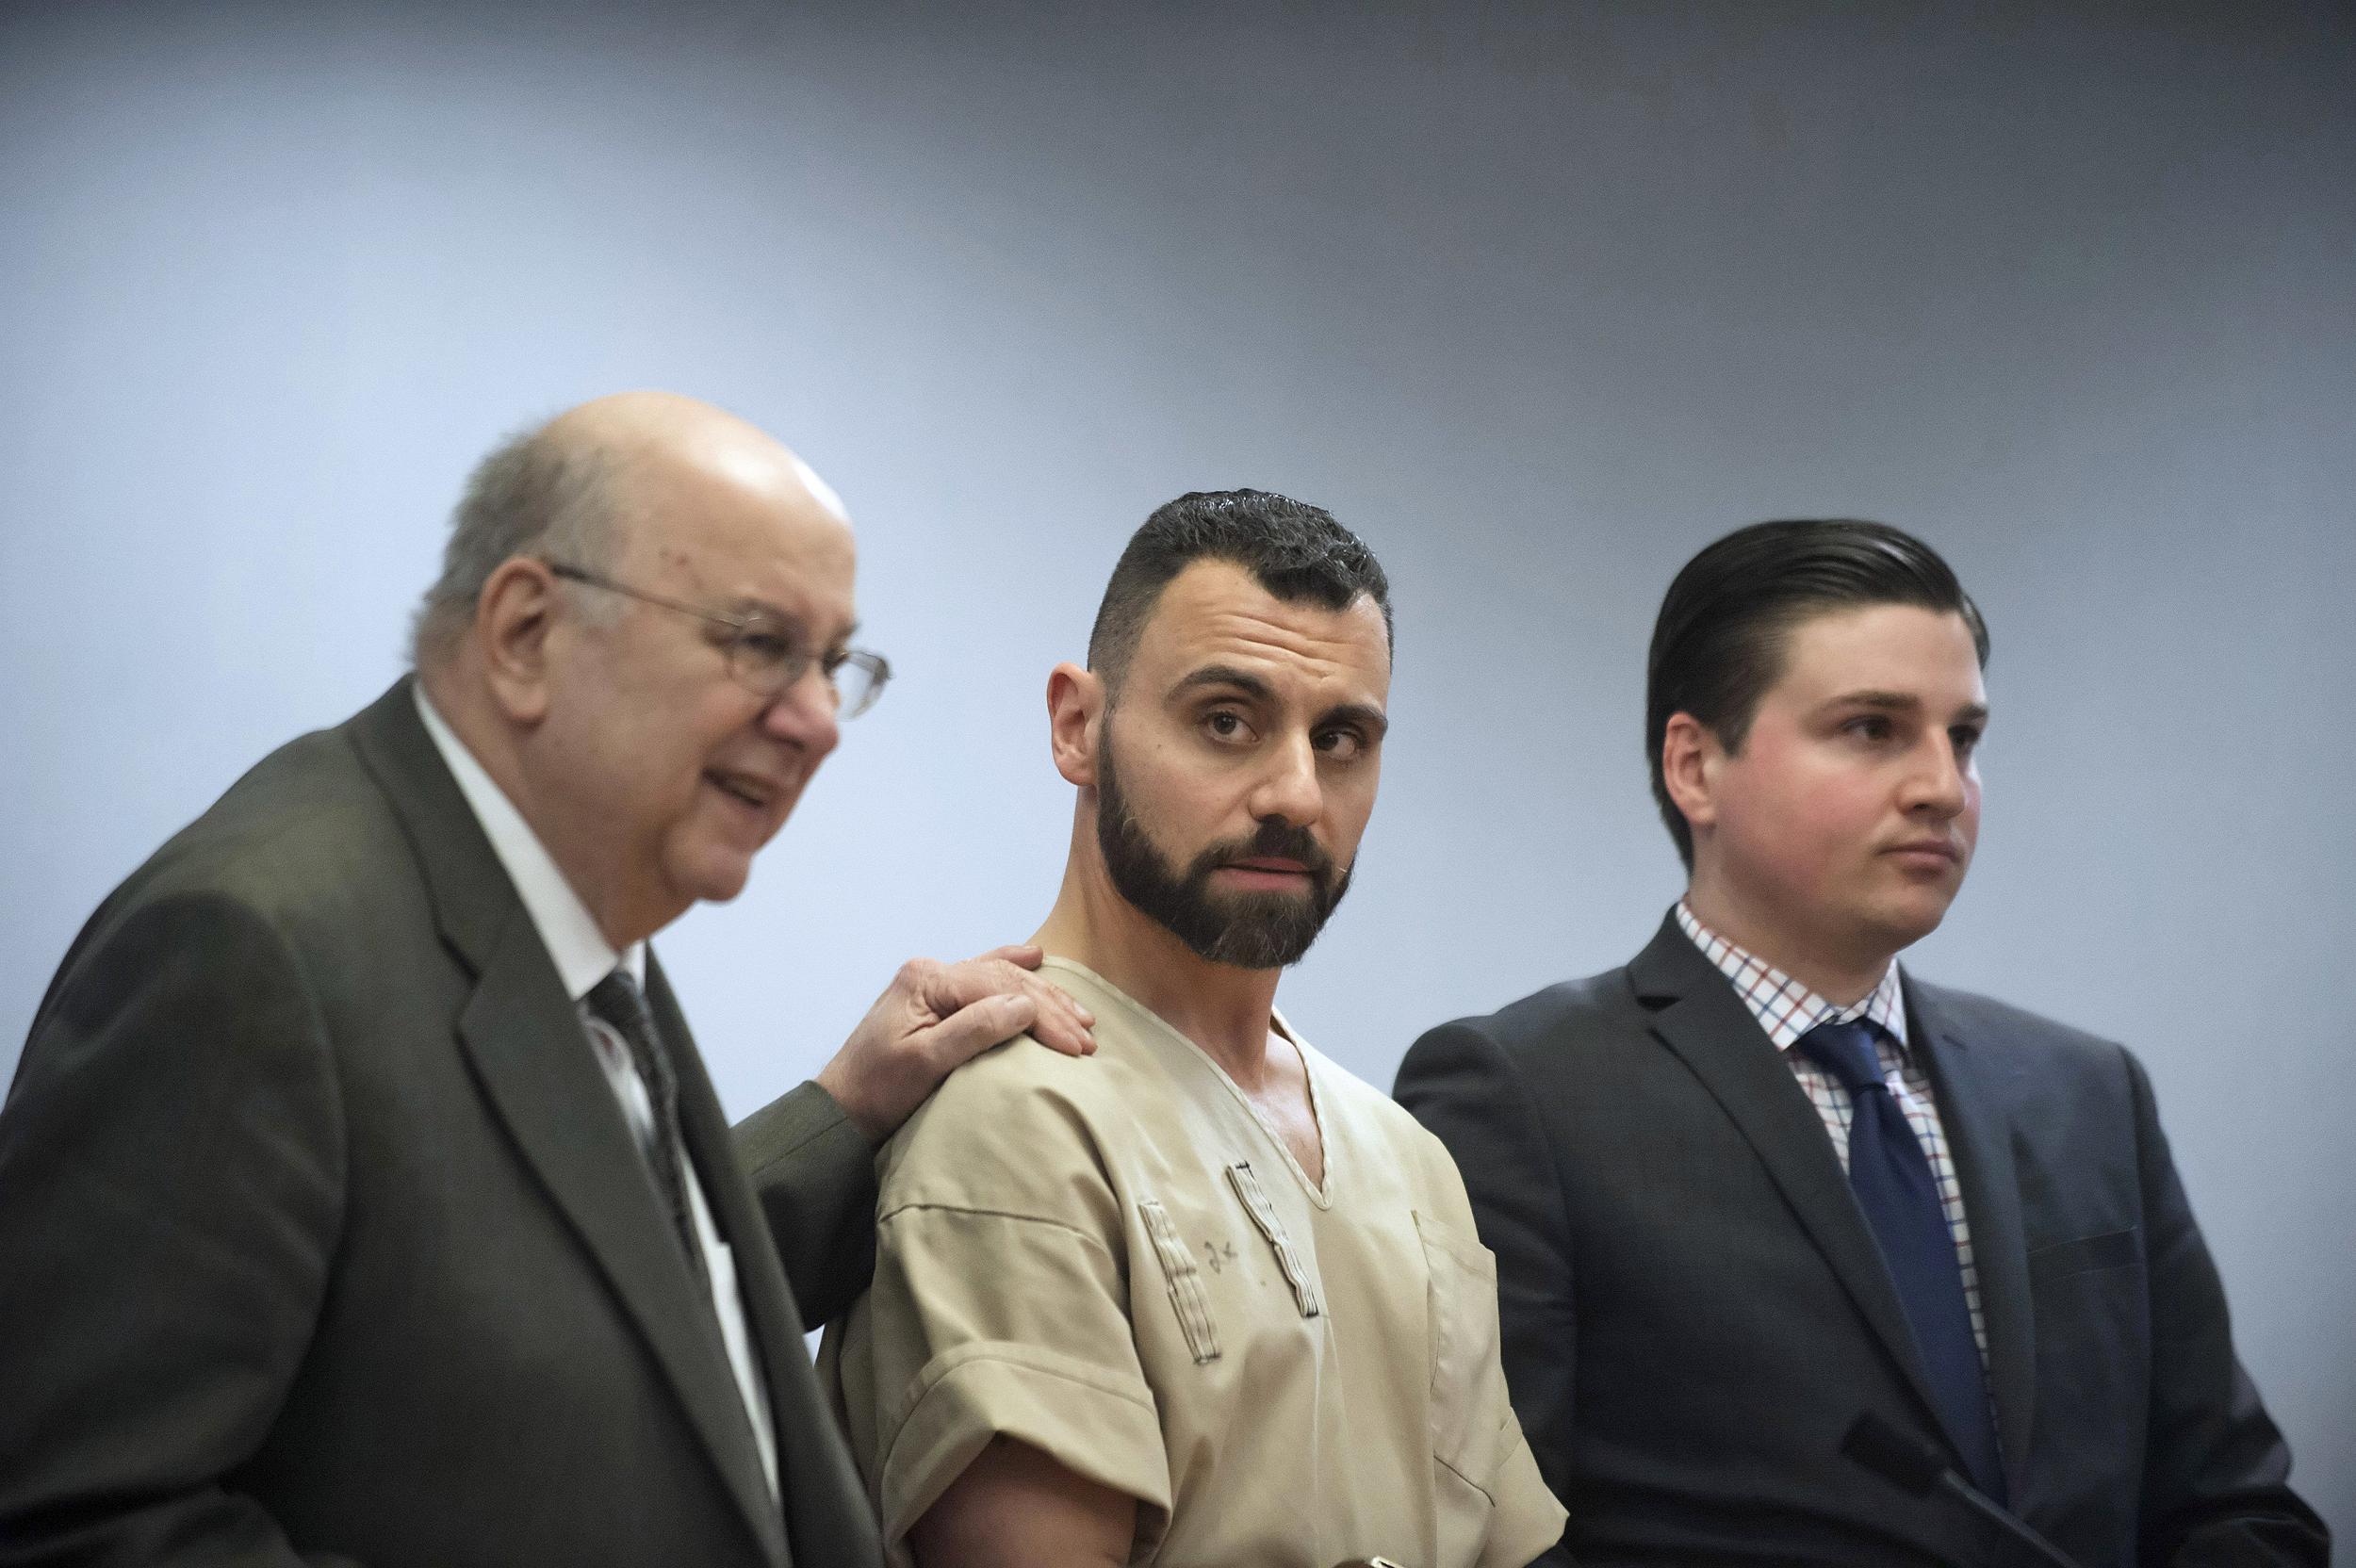 Fitbit Murder Case: Husband Pleads Not Guilty in Wife's Death